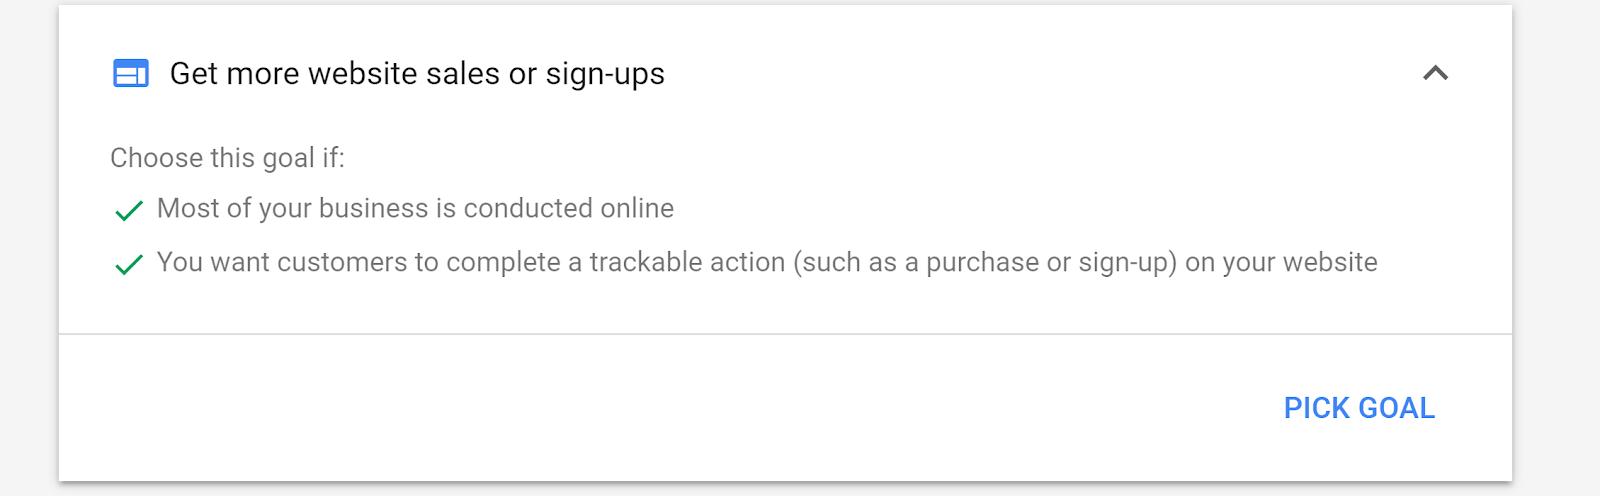 Google Ads Smart Campaign - Step 6